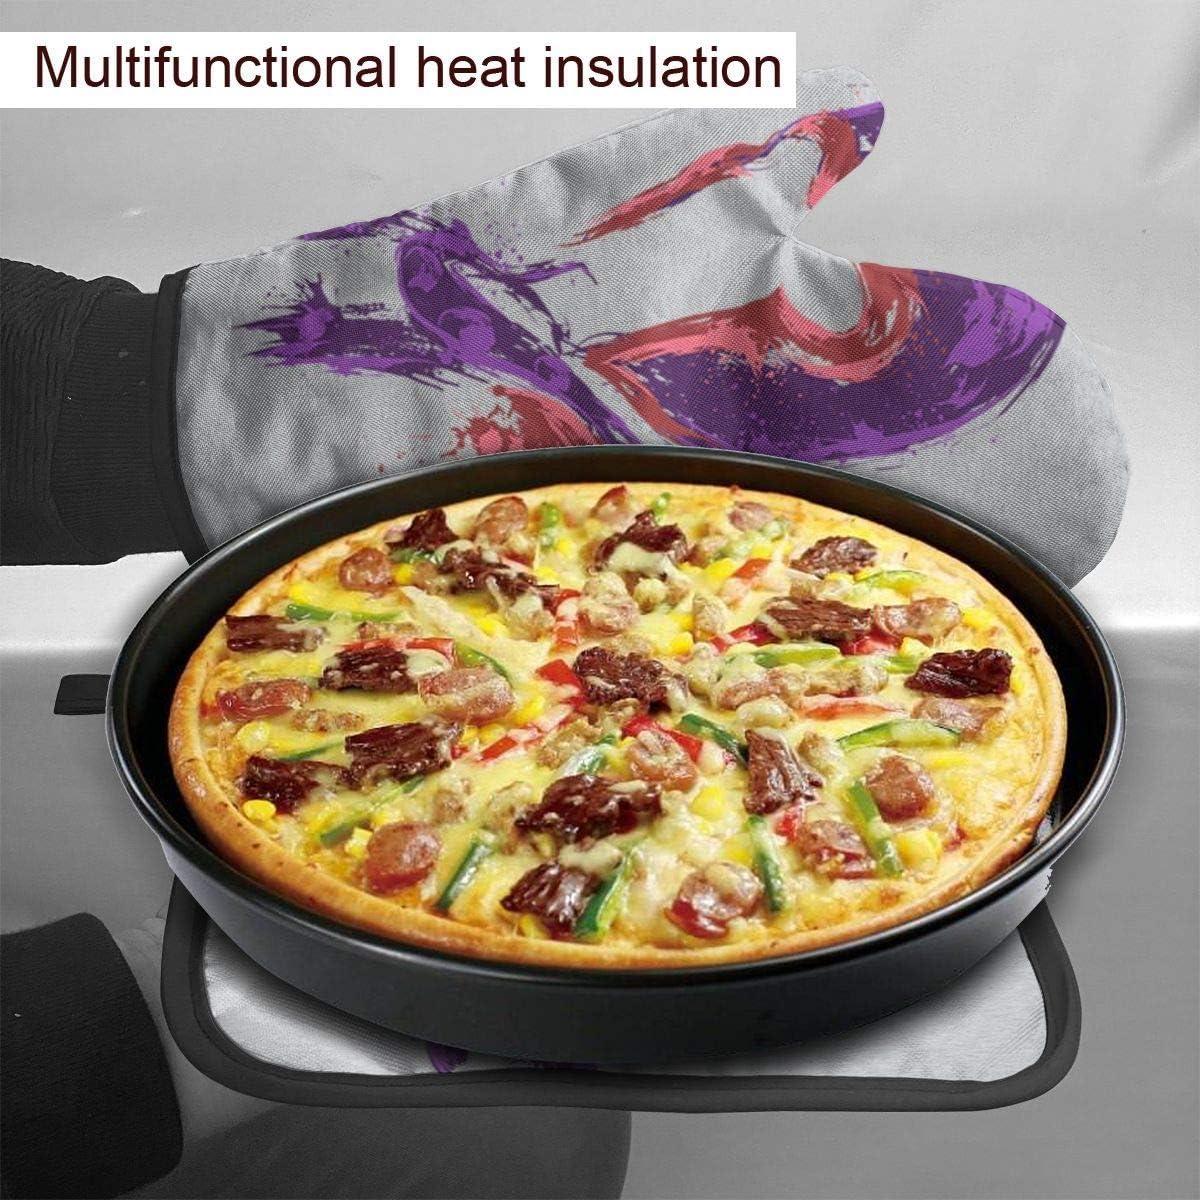 FGHJY X Men Poder del magnetismo Guantes para horno y agarraderas Guantes de cocina resistentes al calor Guantes de cocina